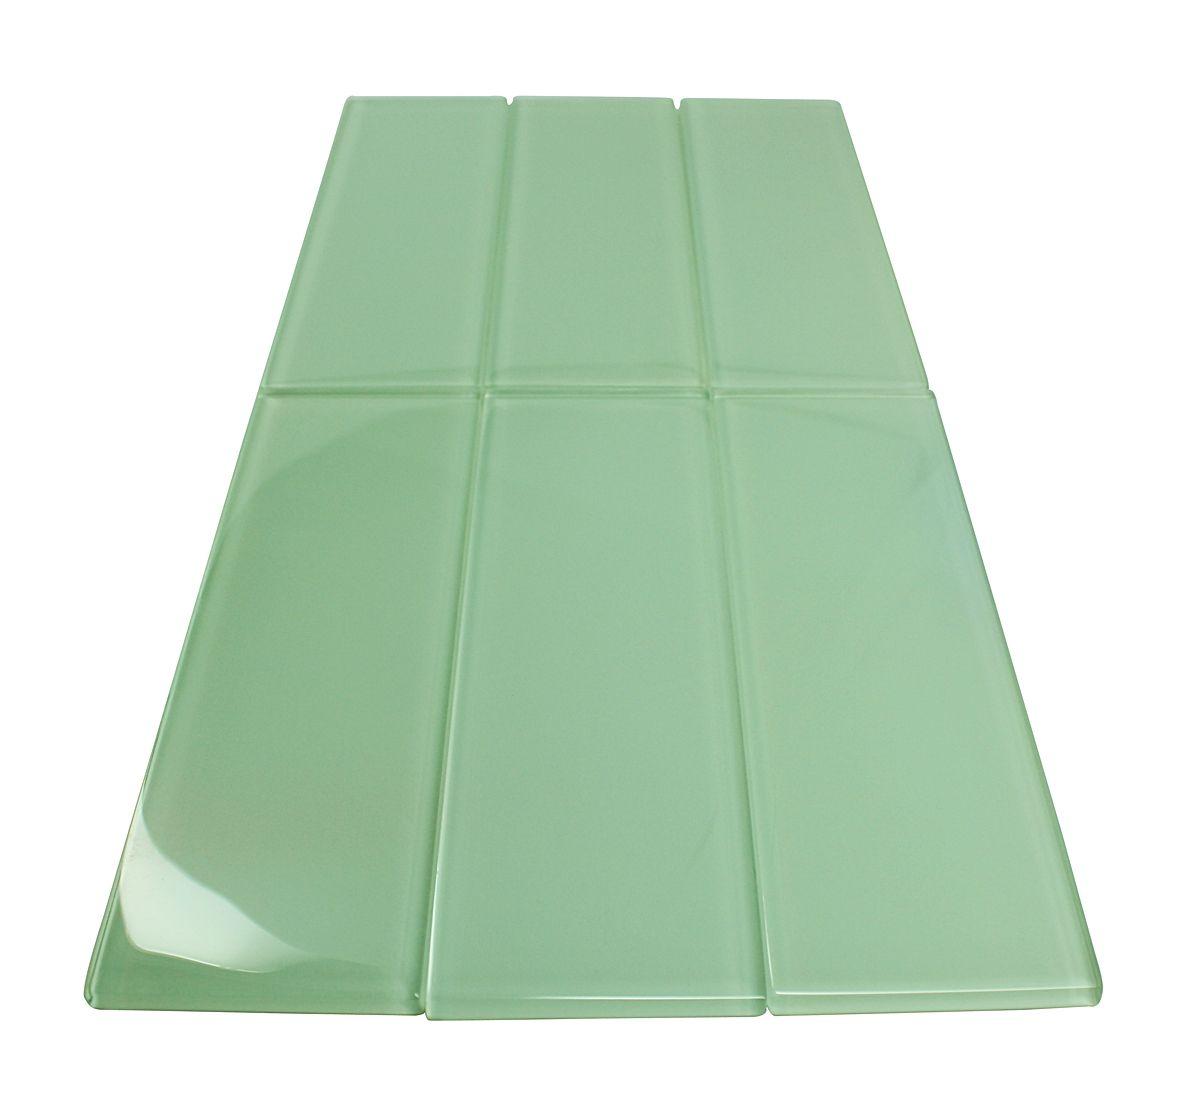 3x9 L009 Glossy Subway Tile Tumbled Marble Tile